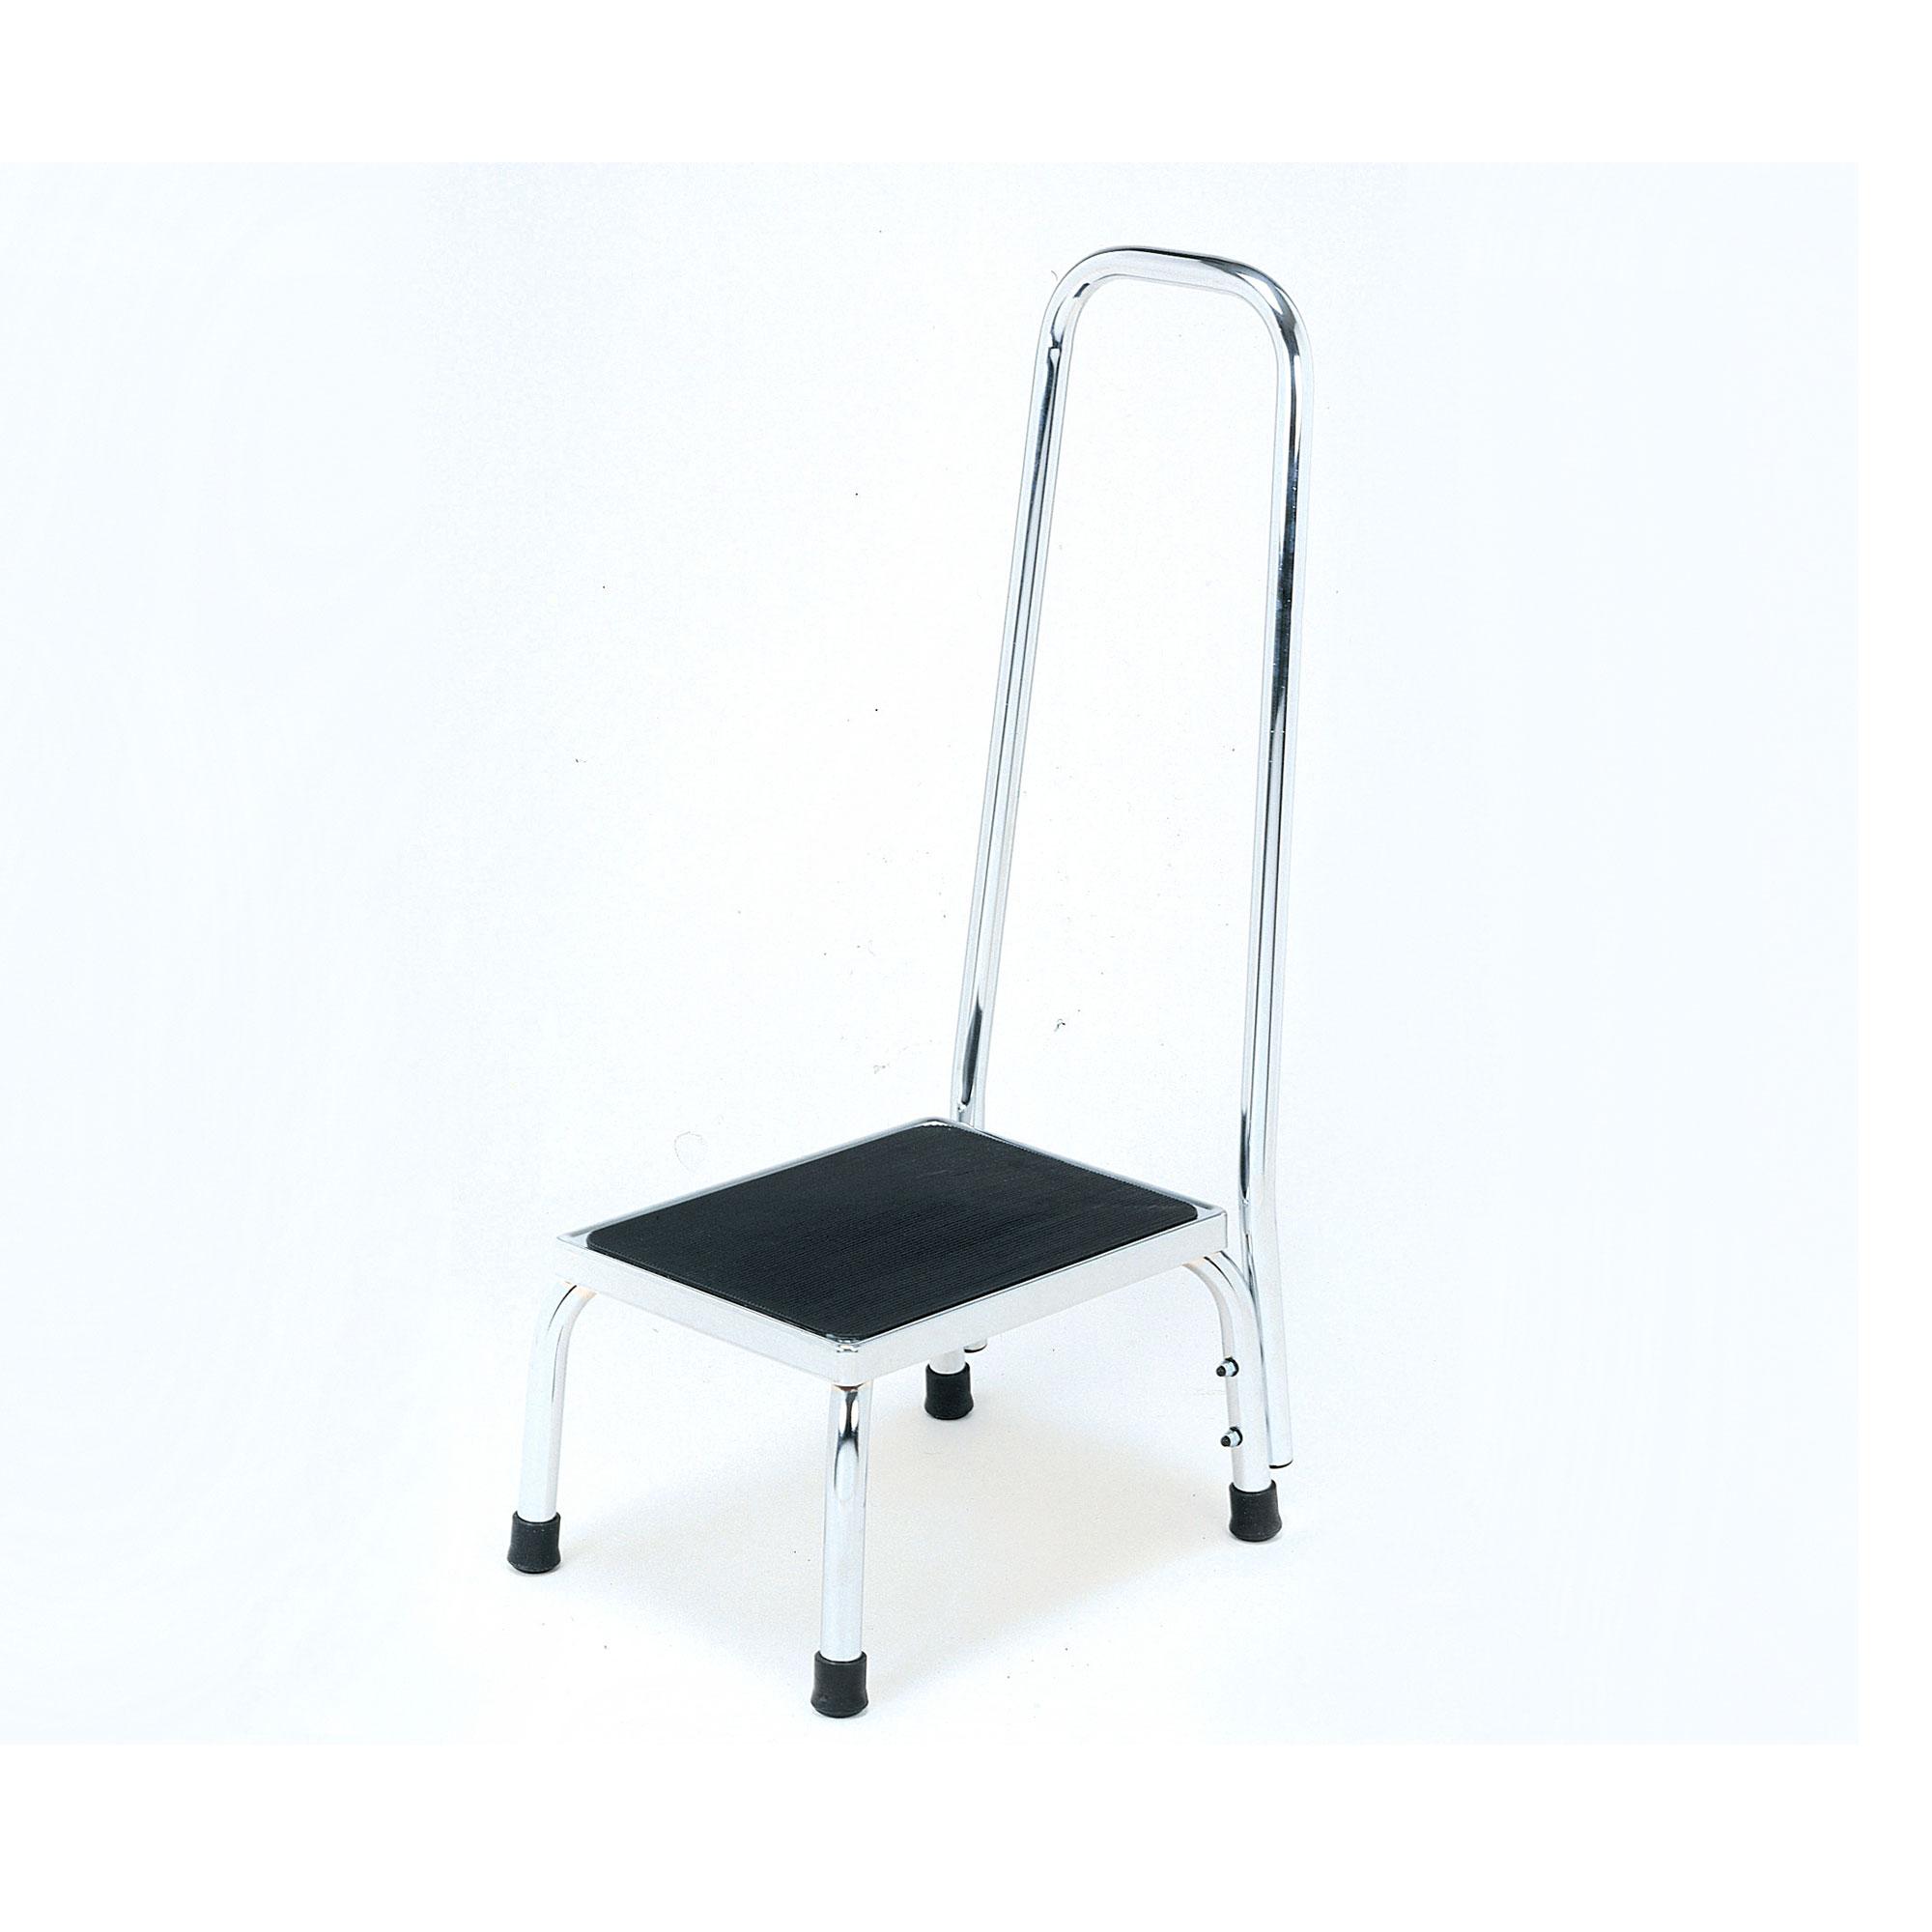 4055A : Bath Step Stool with Handrail - Roma Medical